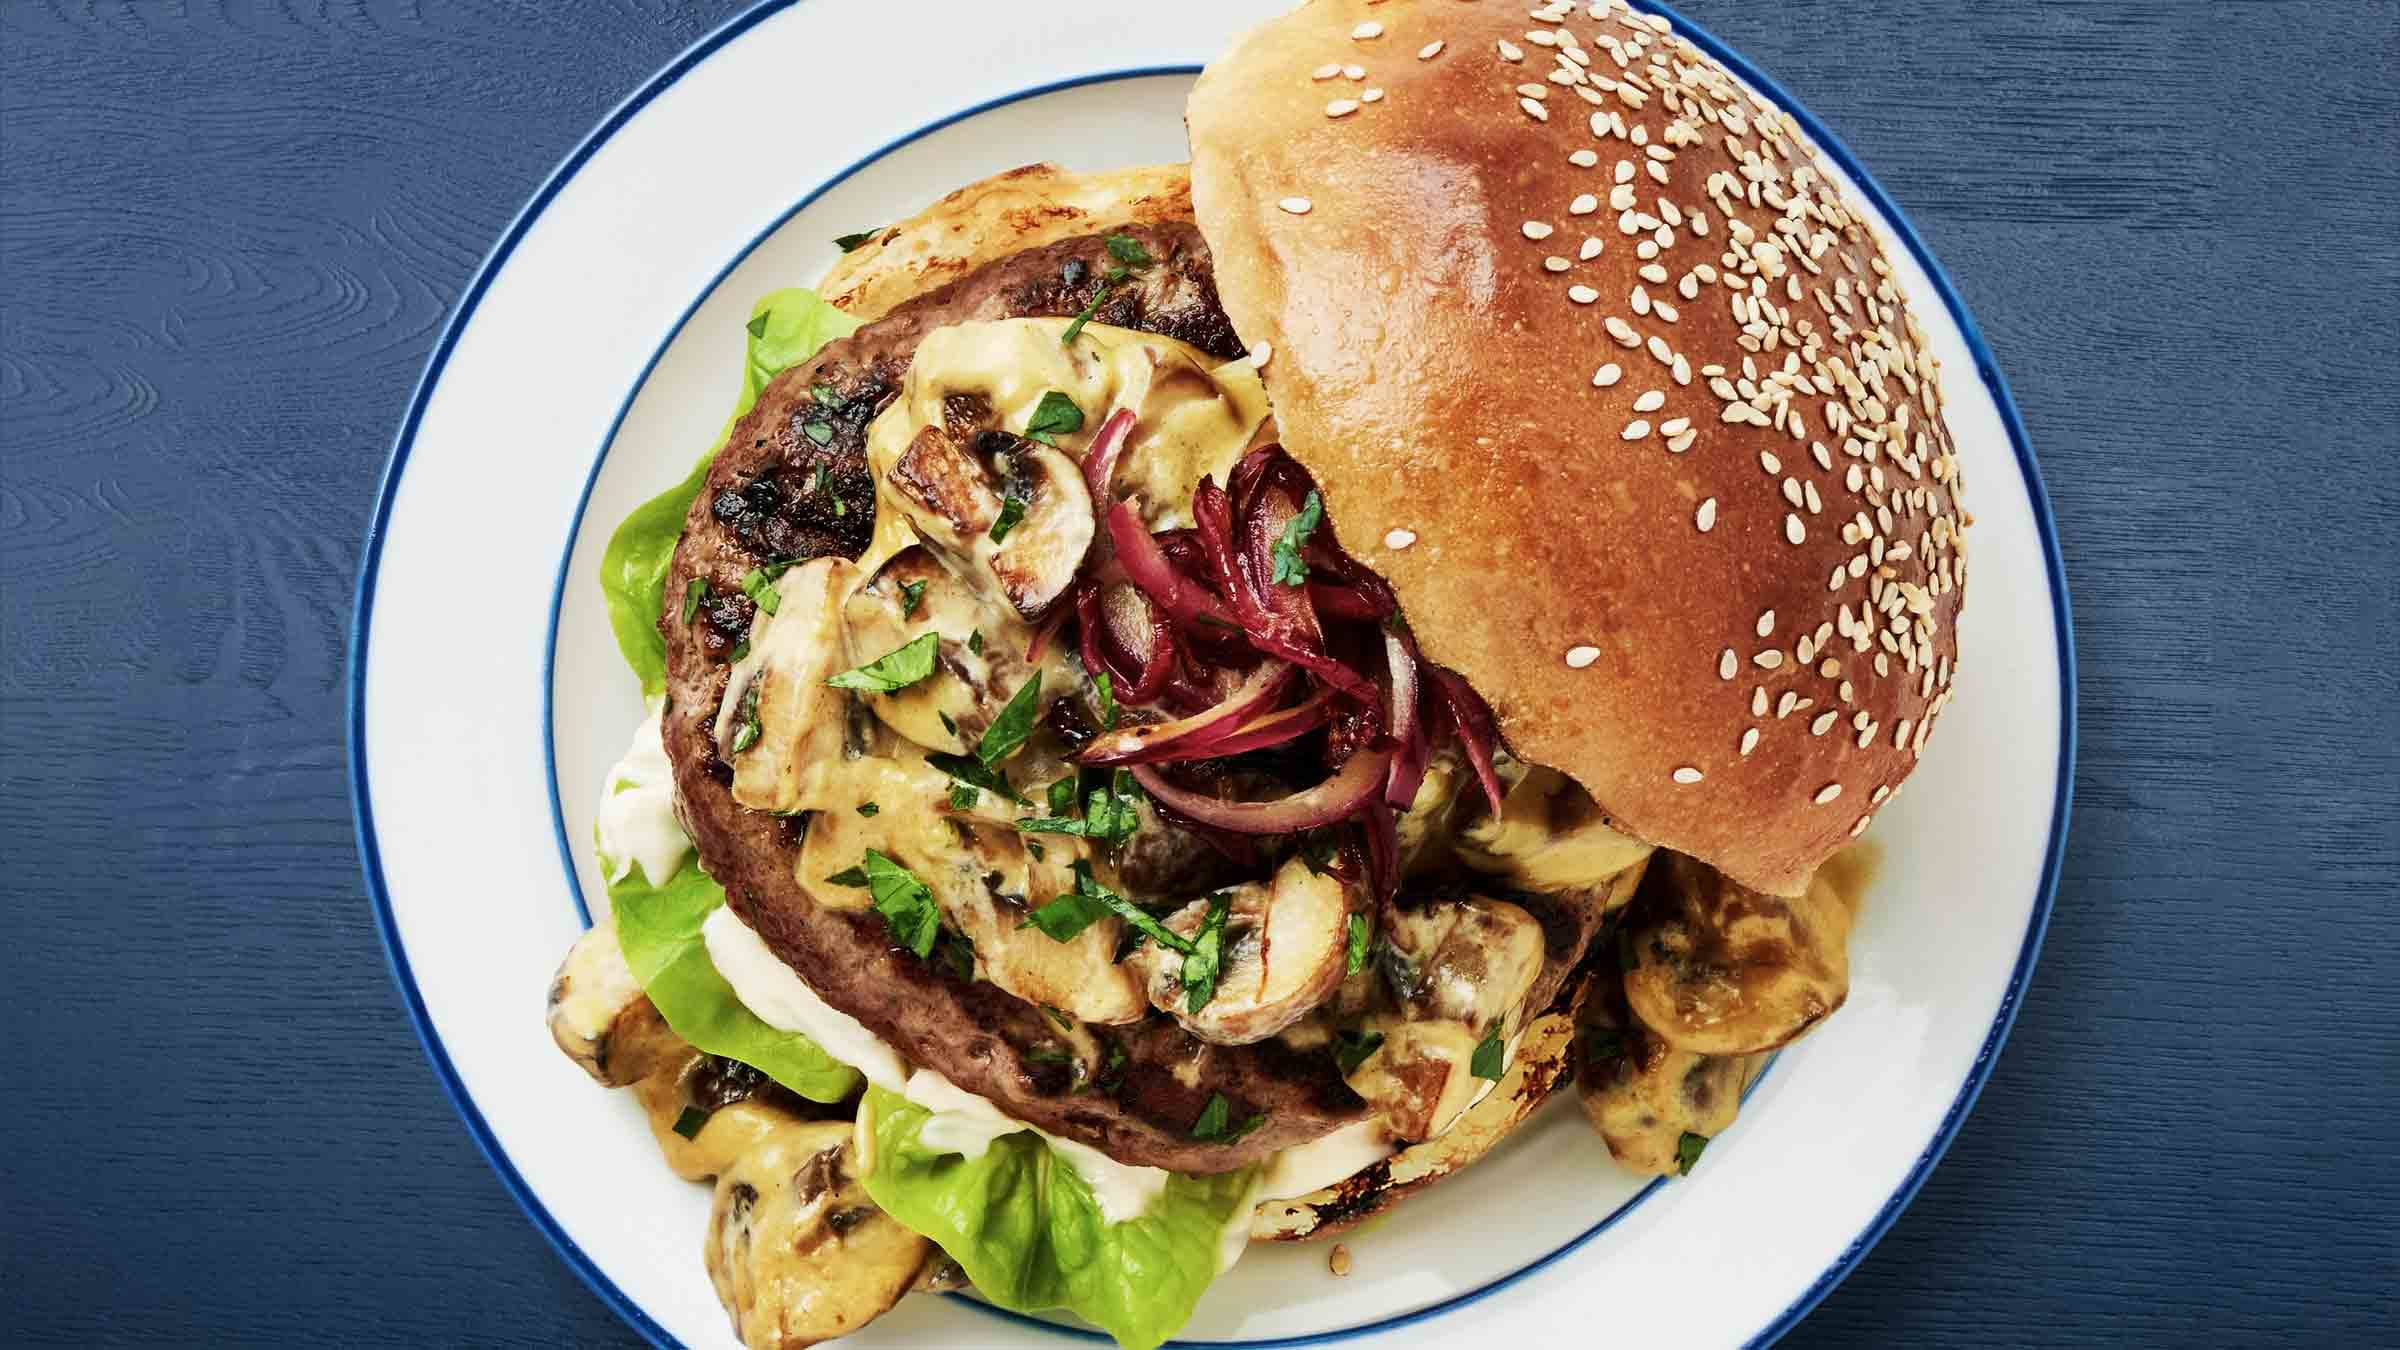 Creamy Mushroom Burger Recipe